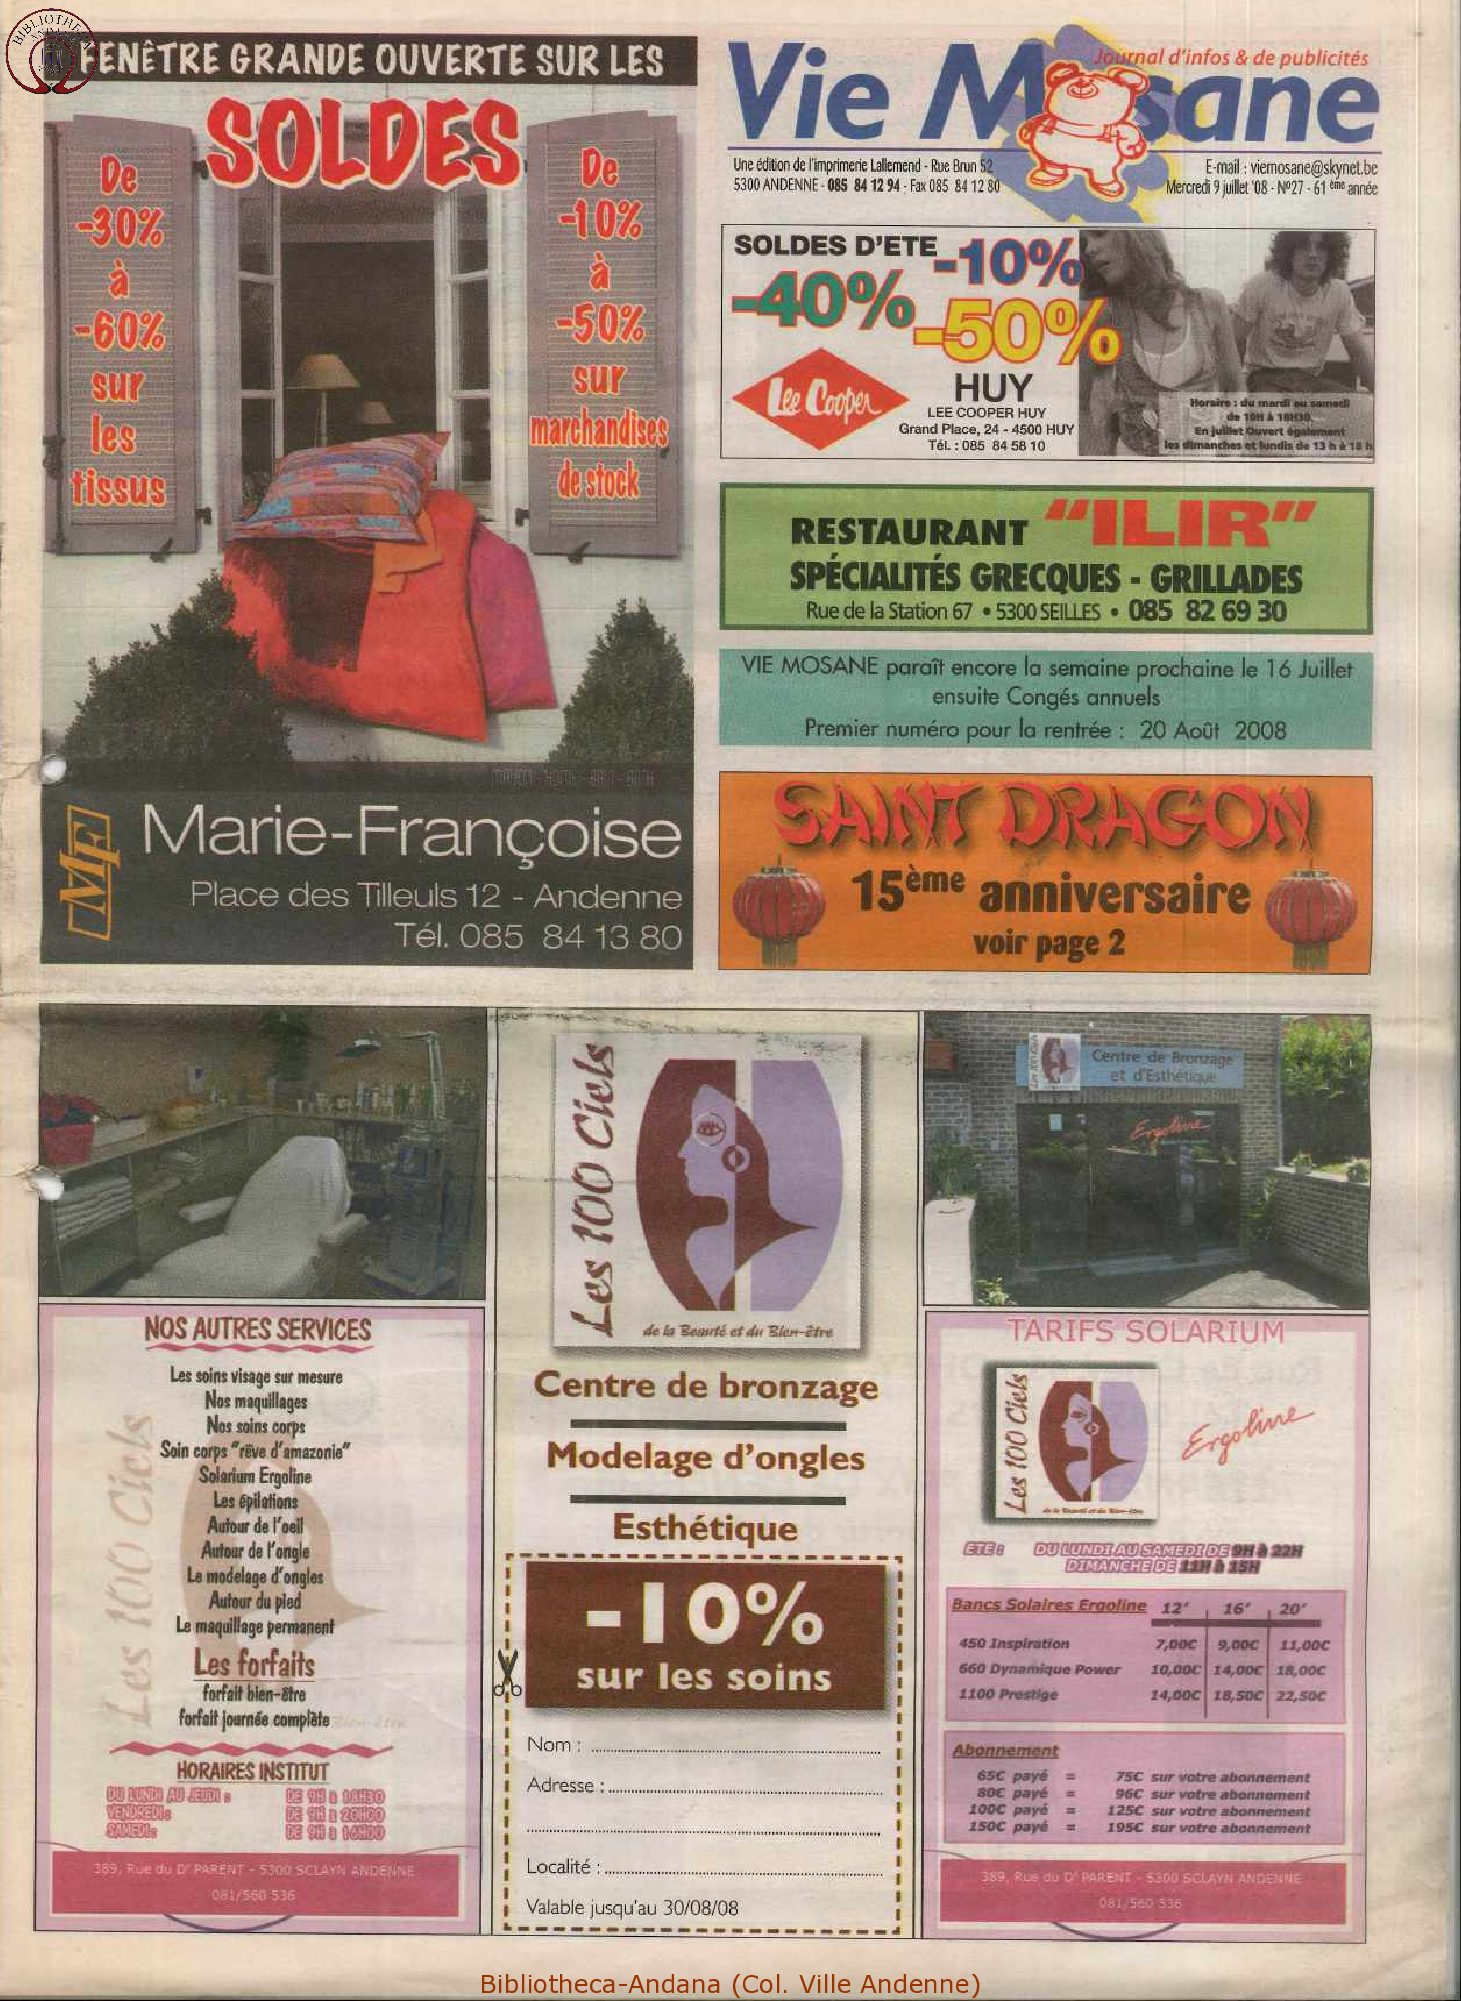 61e année - n°27 - 9 juillet 2008